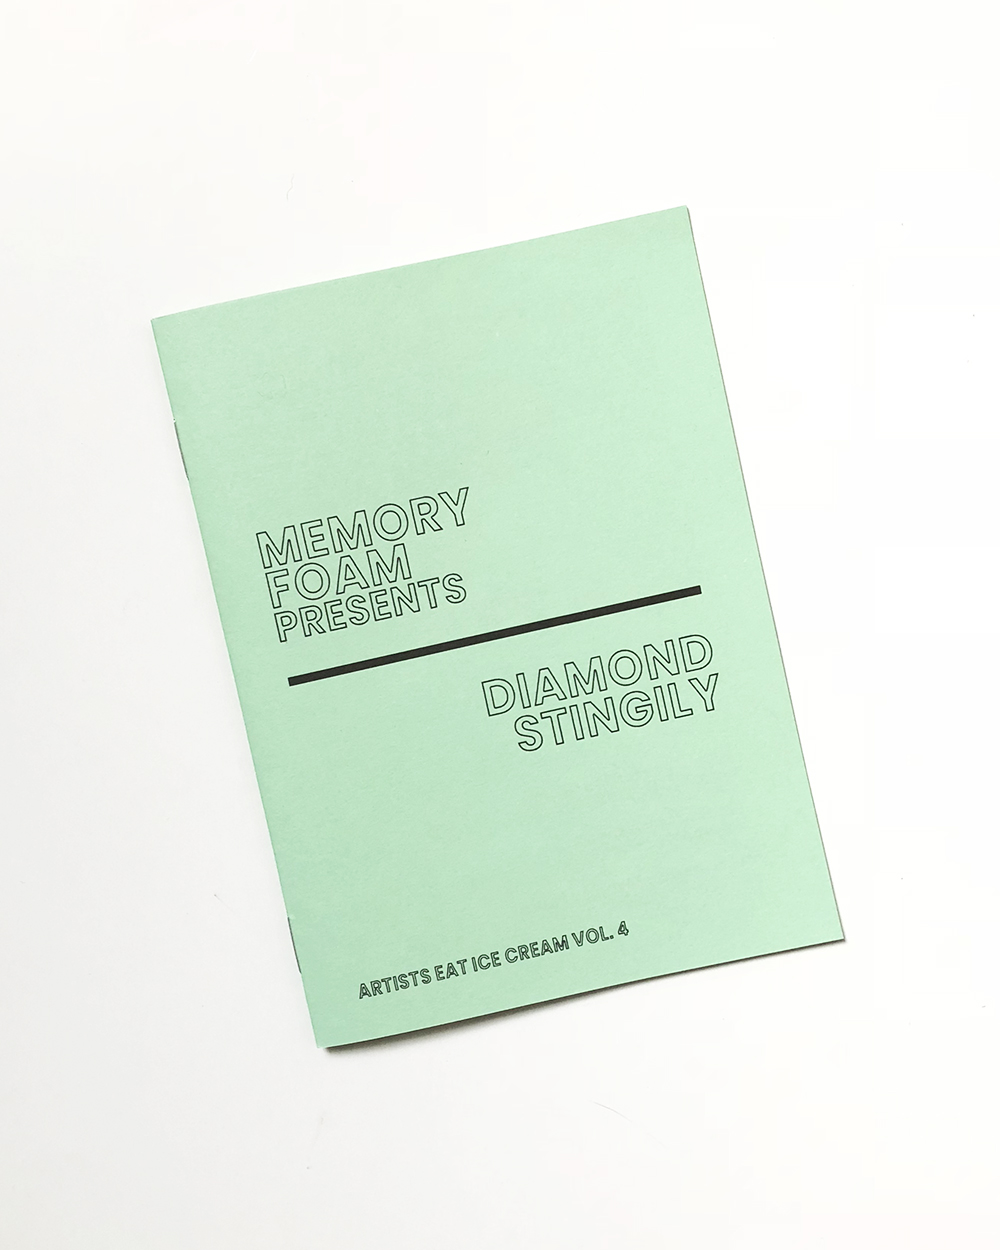 Artists Eat Ice Cream Vol. 4 - Diamond Stingily